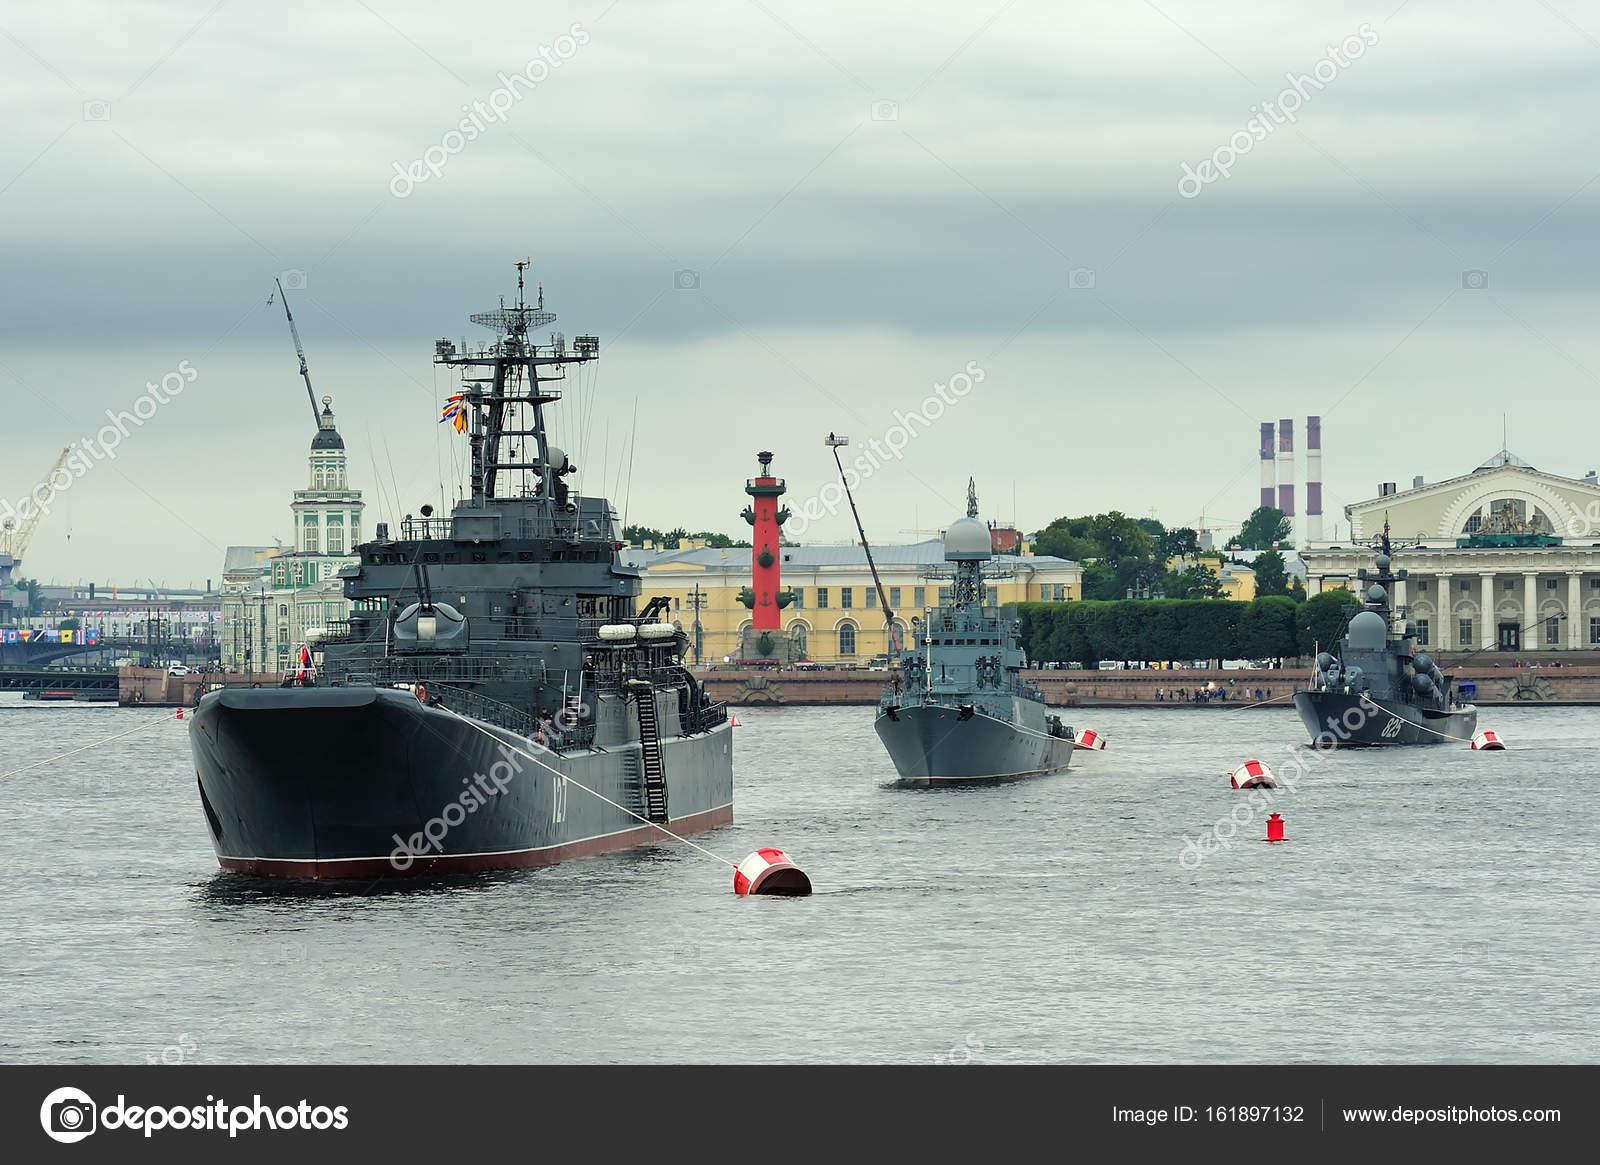 Large landing craft Minsk, anti-submarine corvette Urengoi